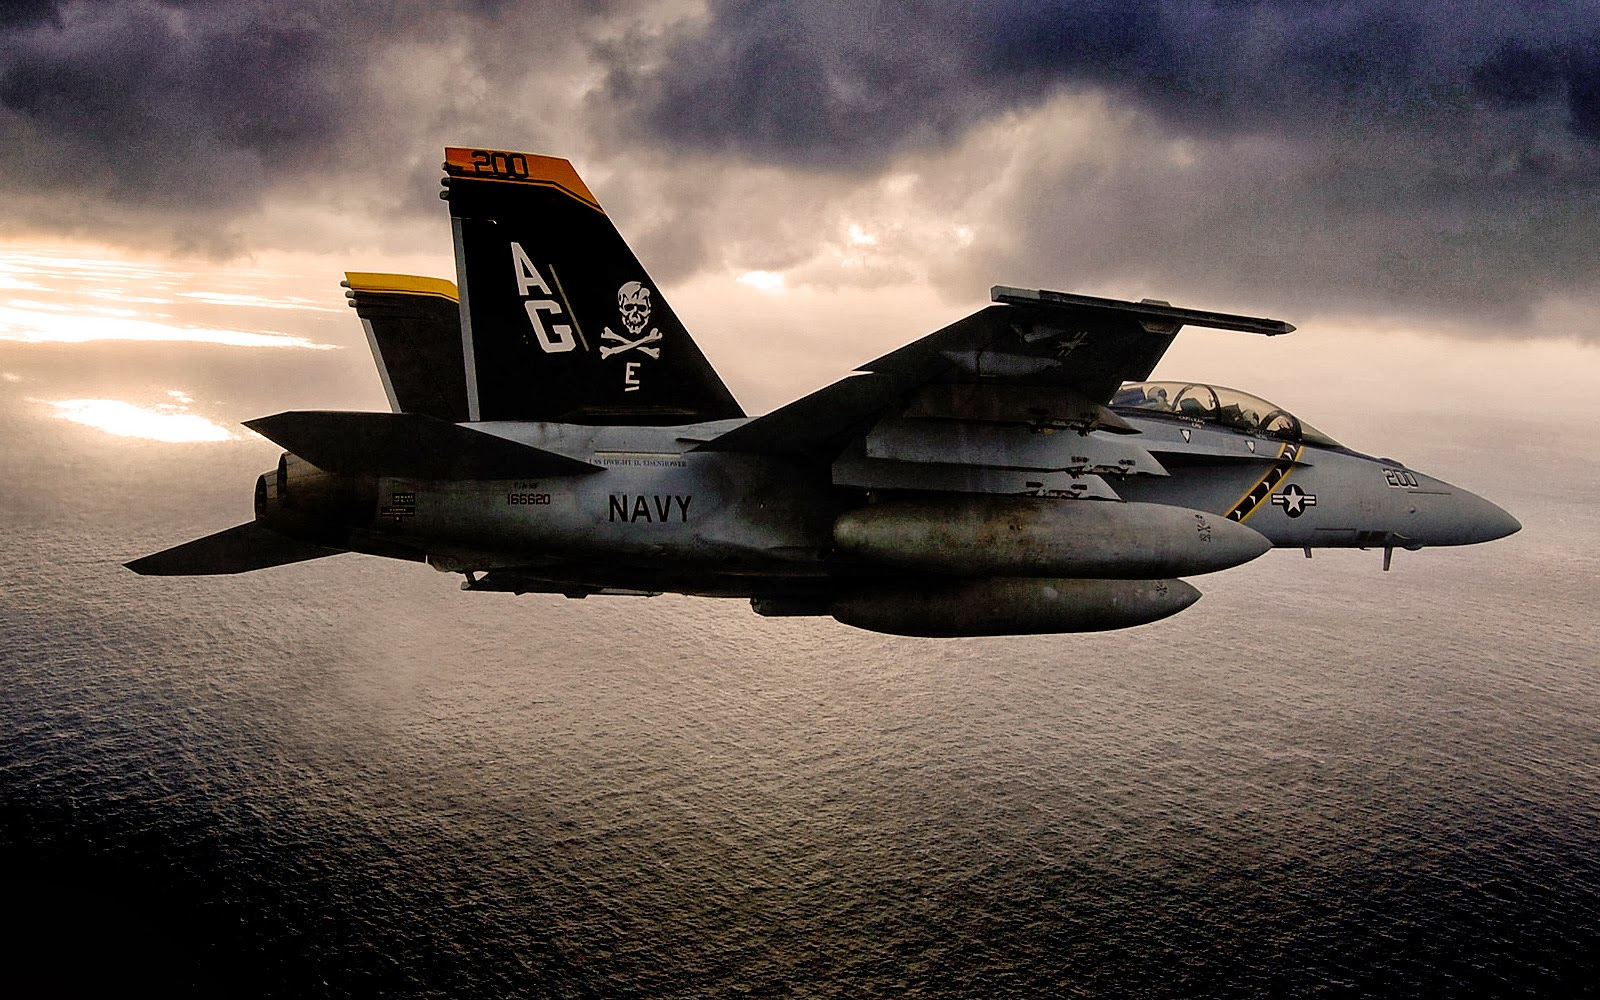 F18 Super Hornet...F 18 Wallpaper